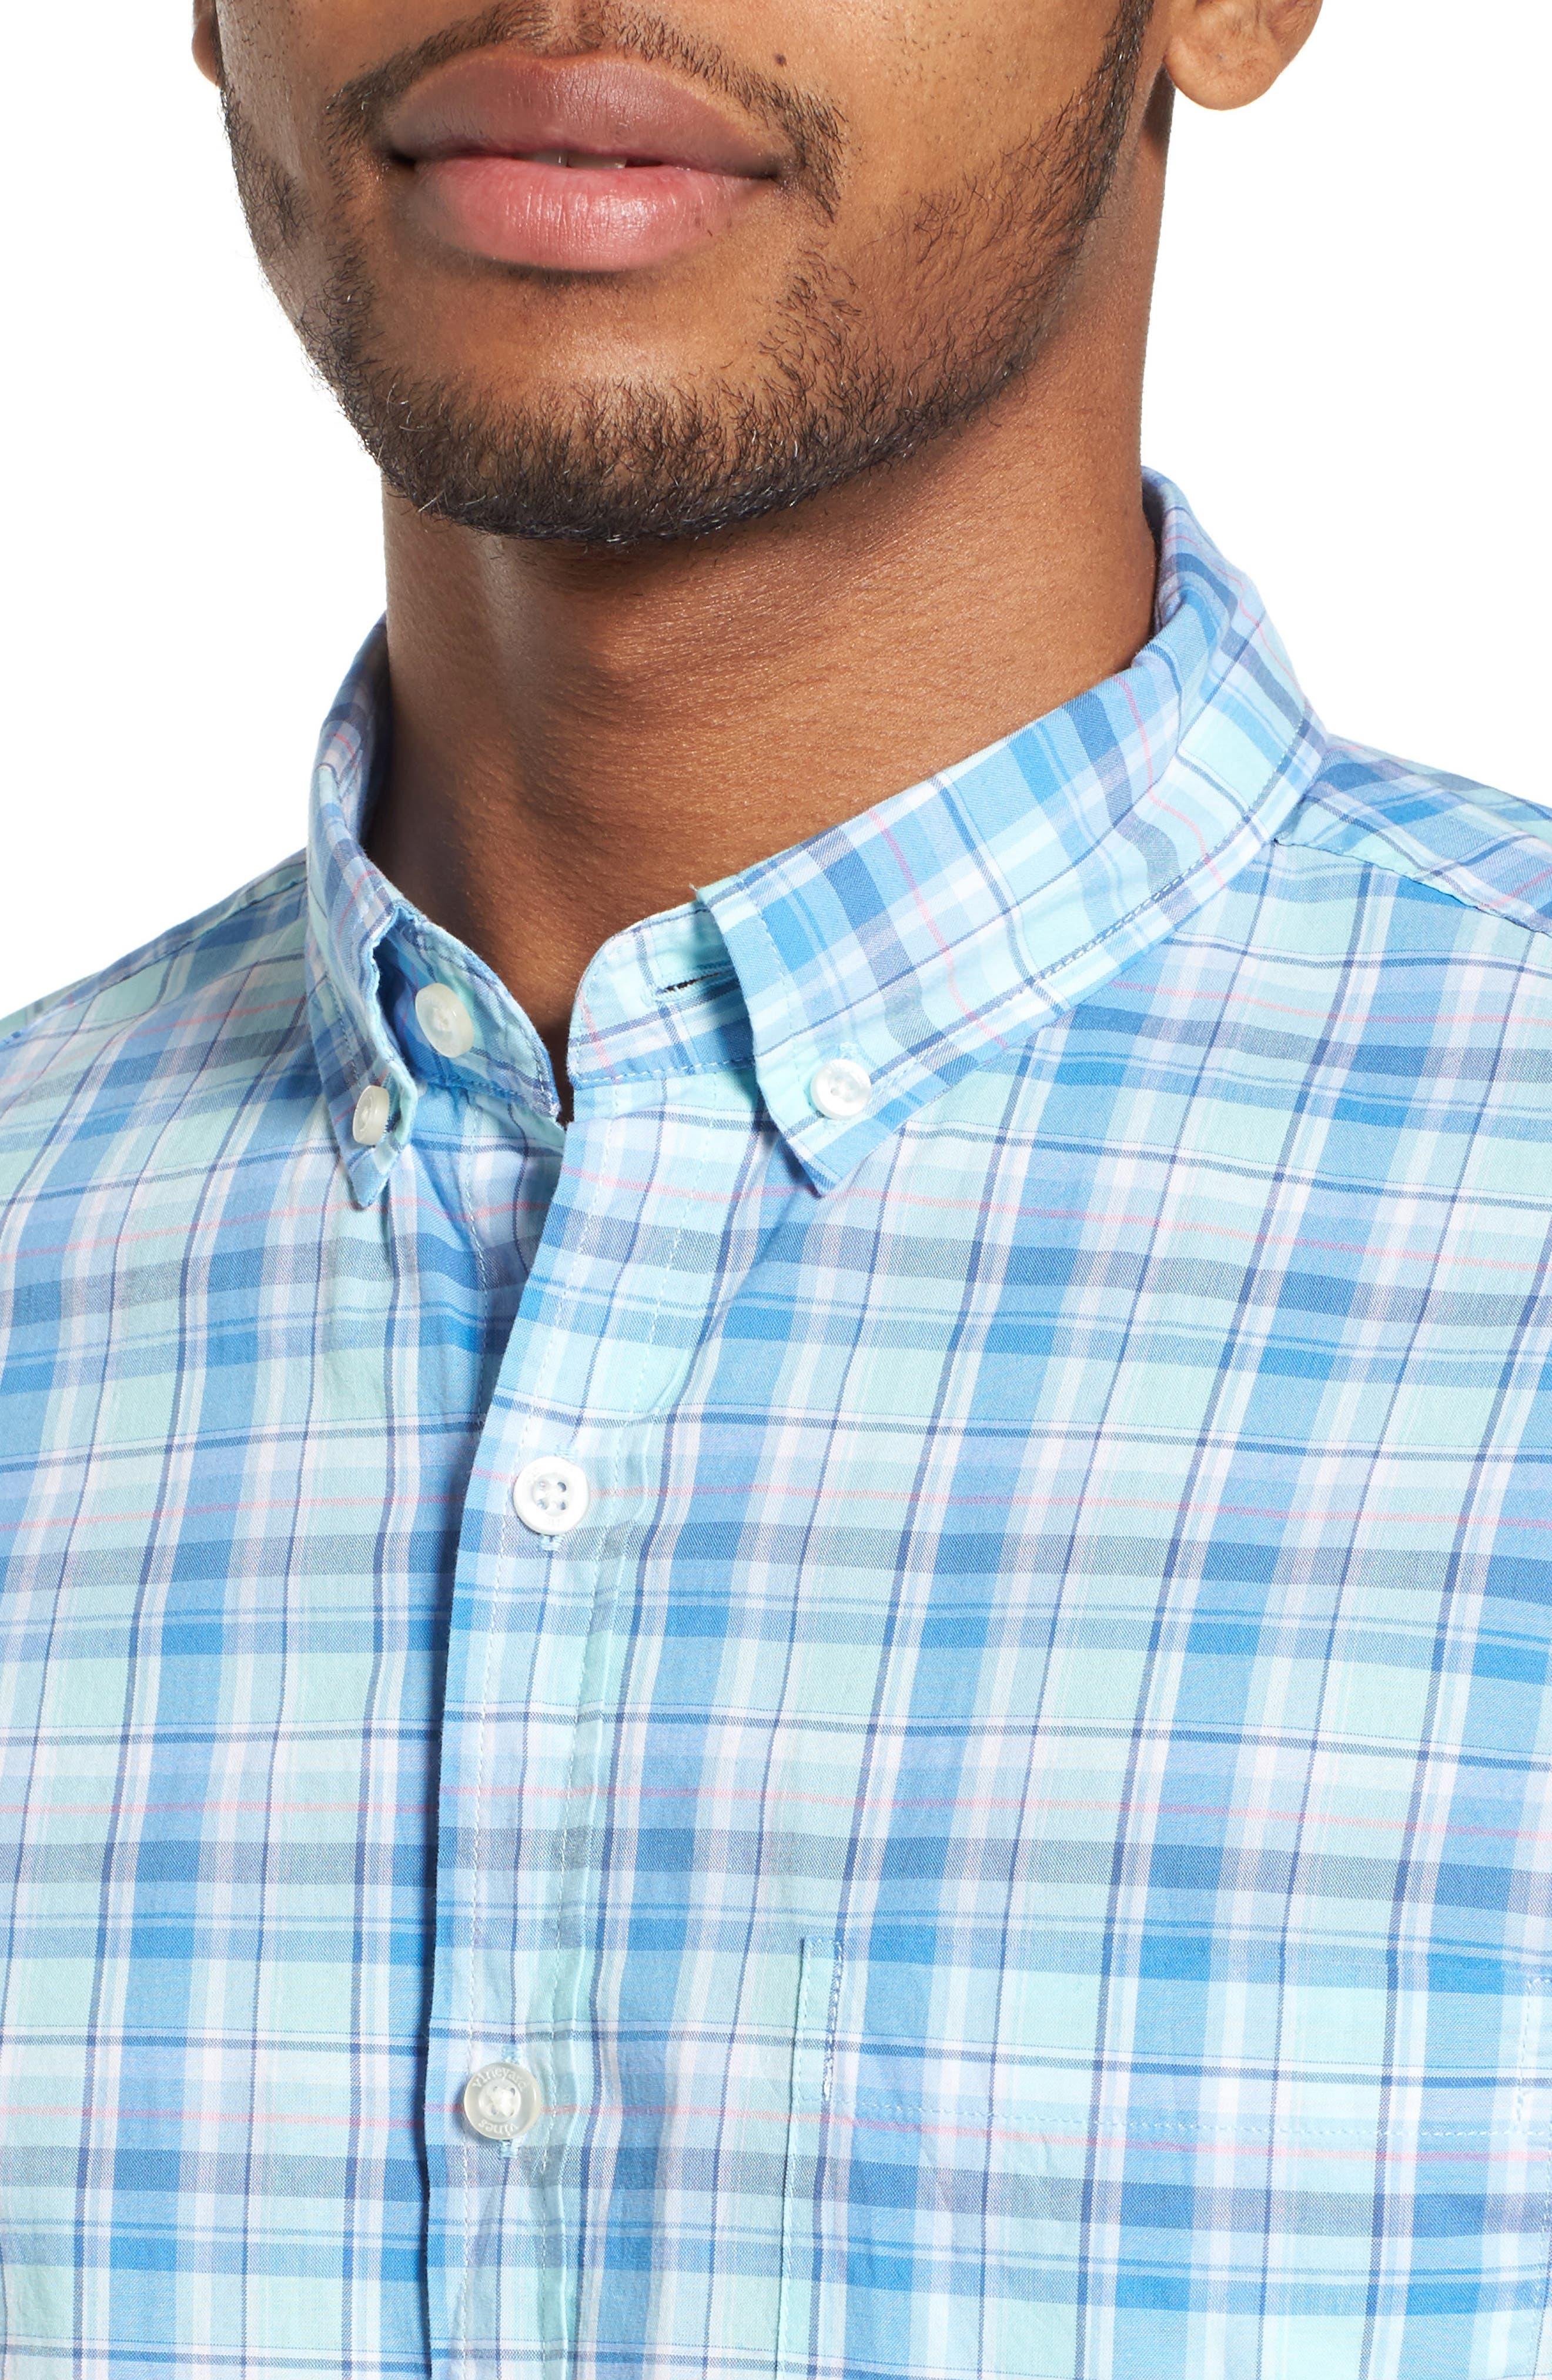 Murray Pine Island Slim Fit Plaid Sport Shirt,                             Alternate thumbnail 4, color,                             Sea Splash